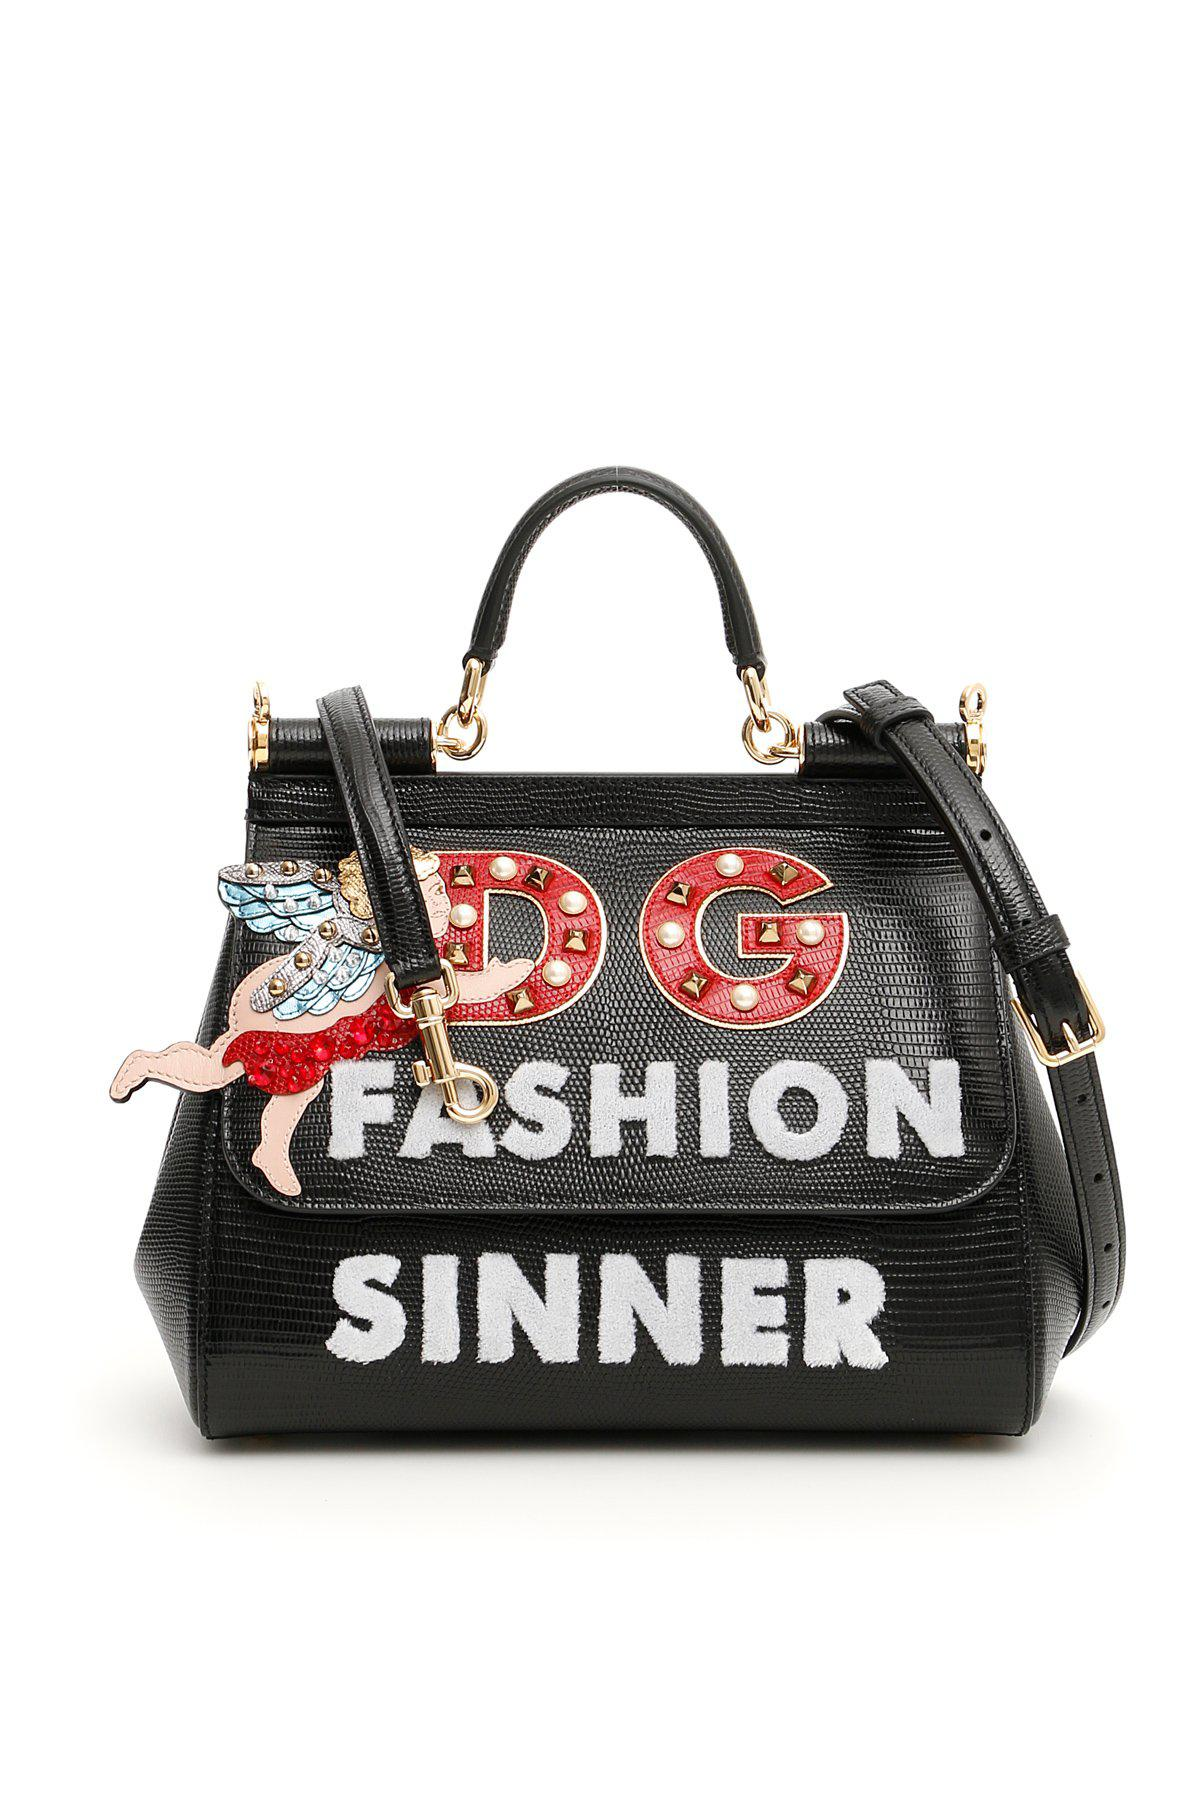 d1e8d244f935 Lyst - Dolce   Gabbana Medium Sicily Bag in Black